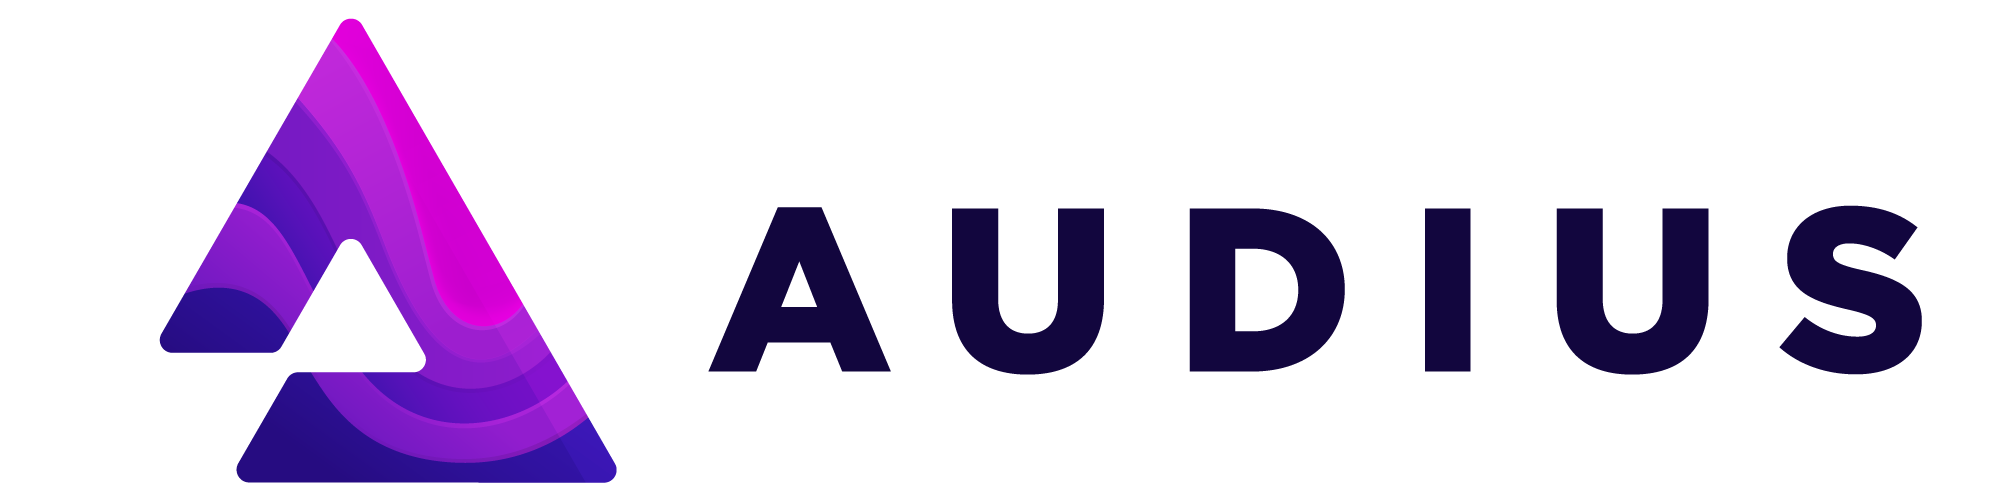 Nansen partner Audius logo